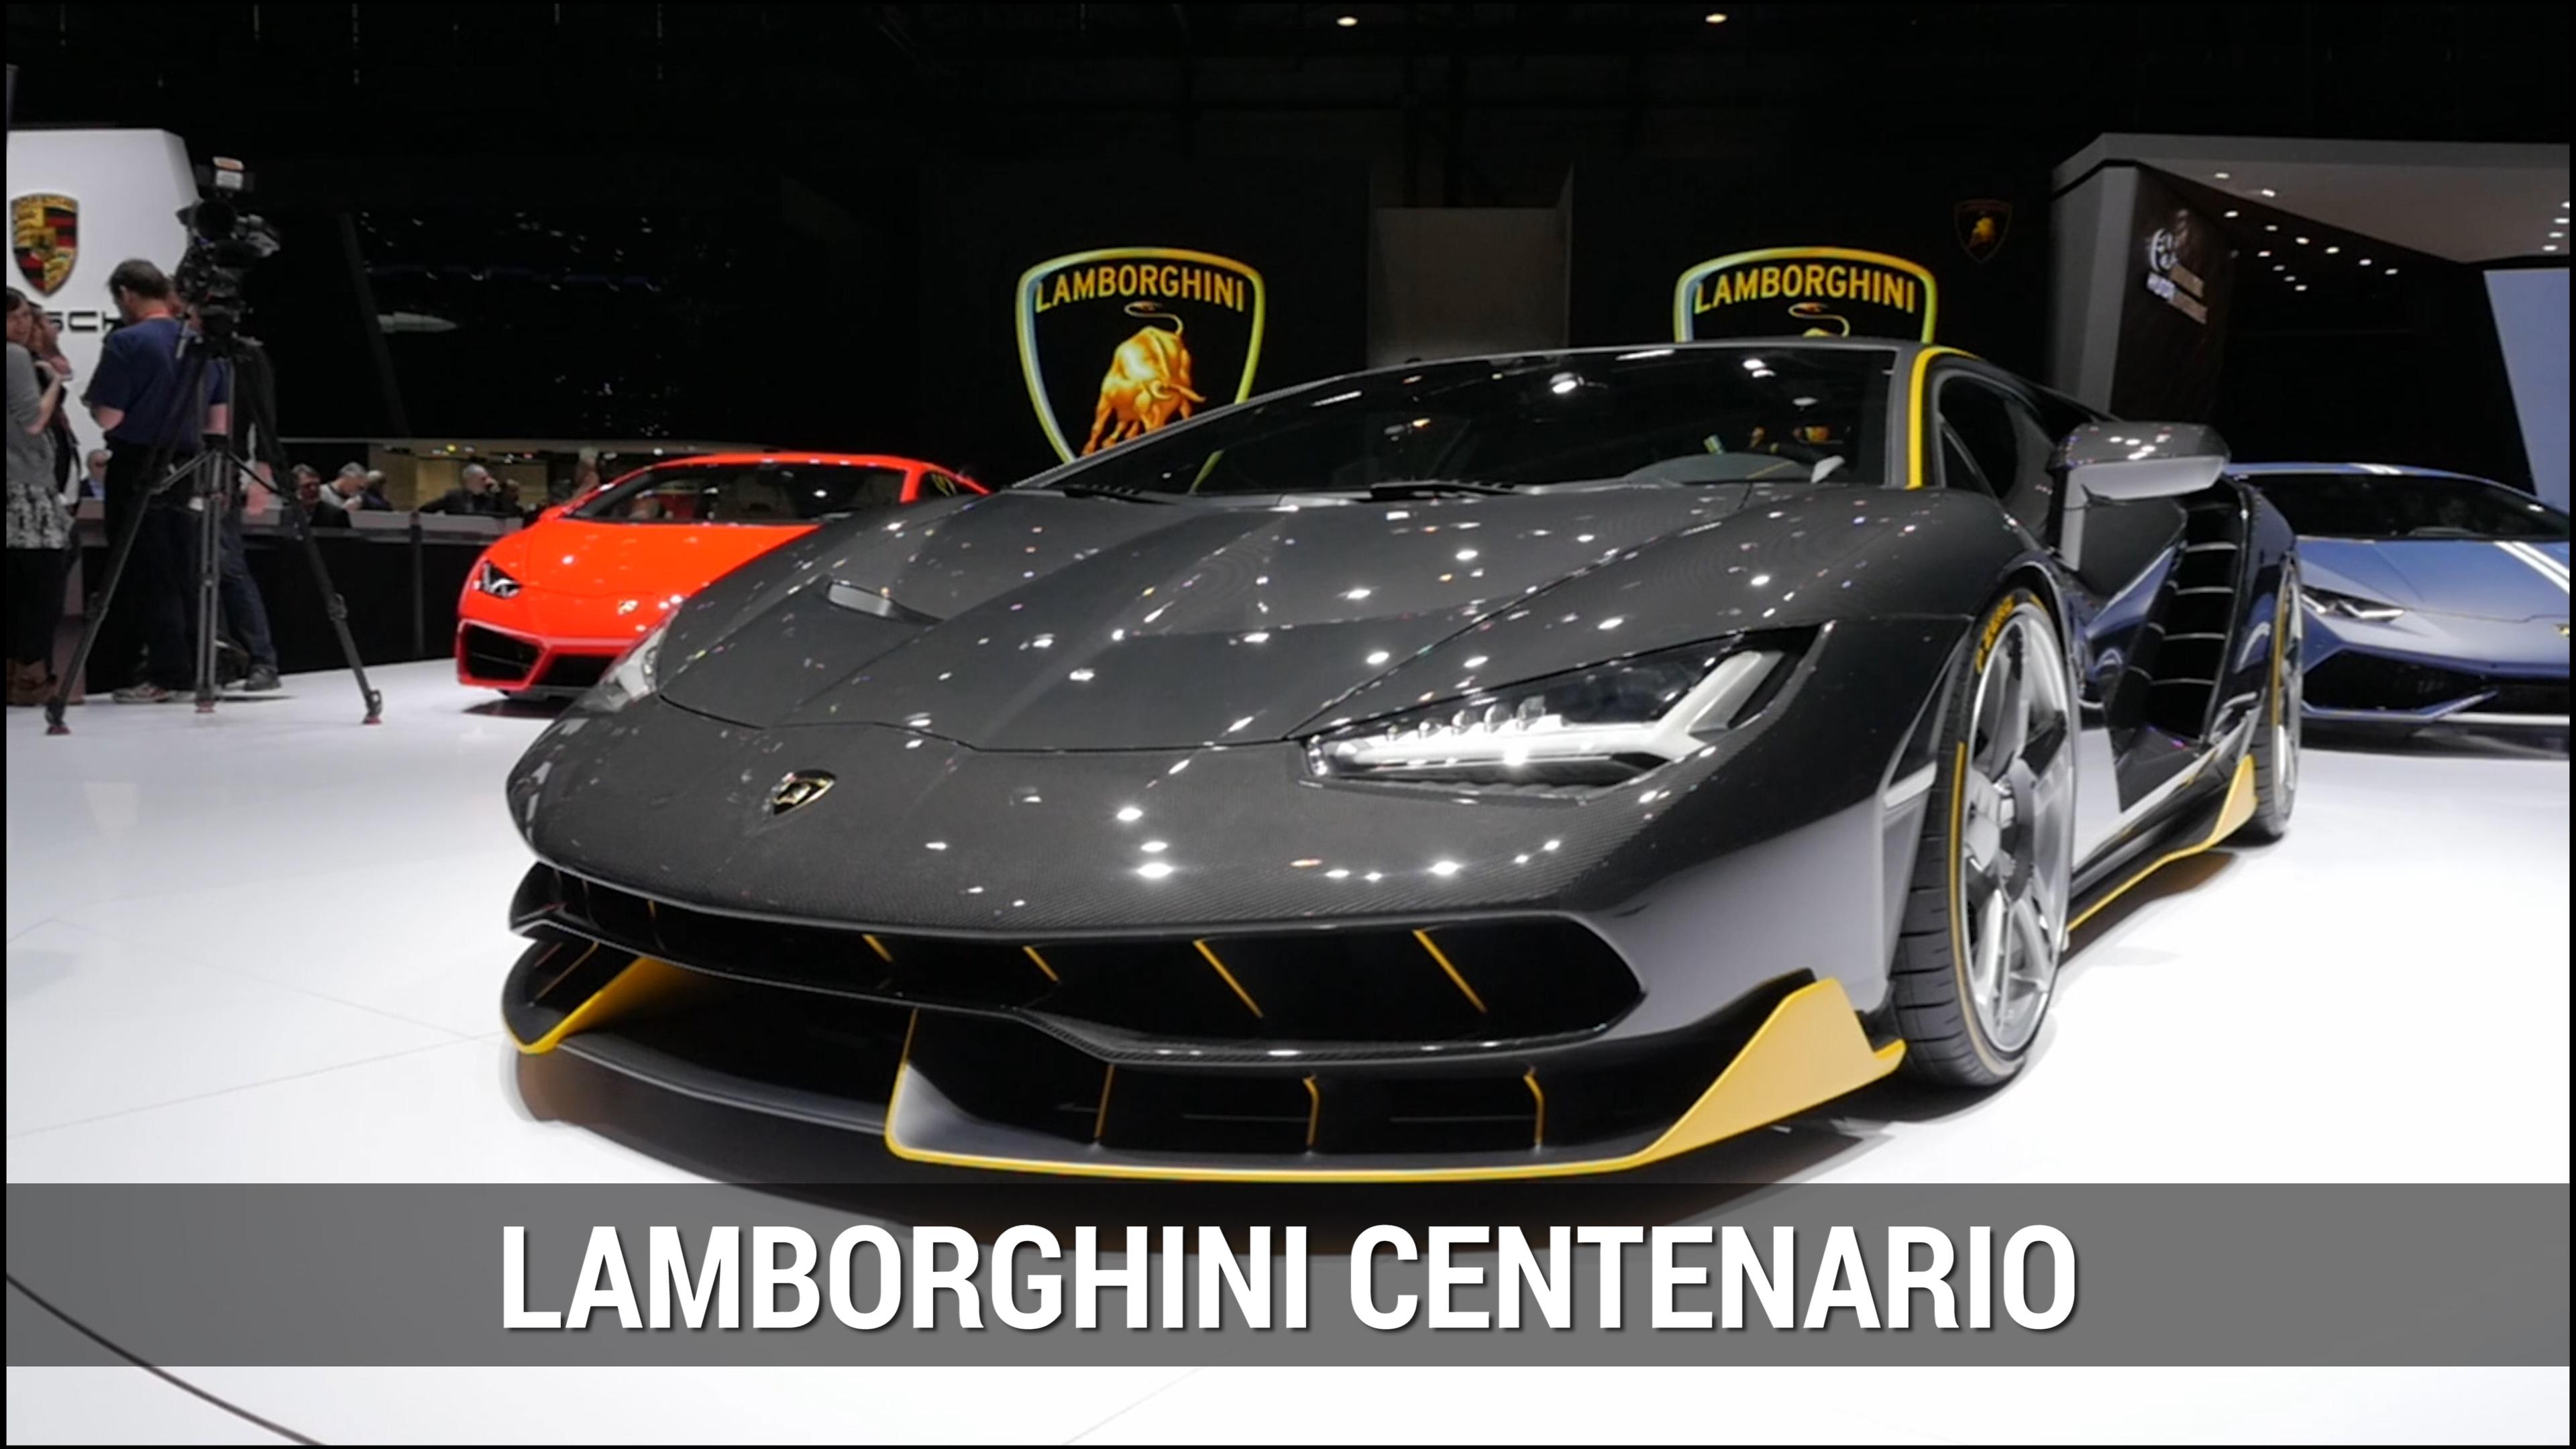 used lamborghini car in gallardo cheap how to steps a flickr valentino spy easy the balboni training own